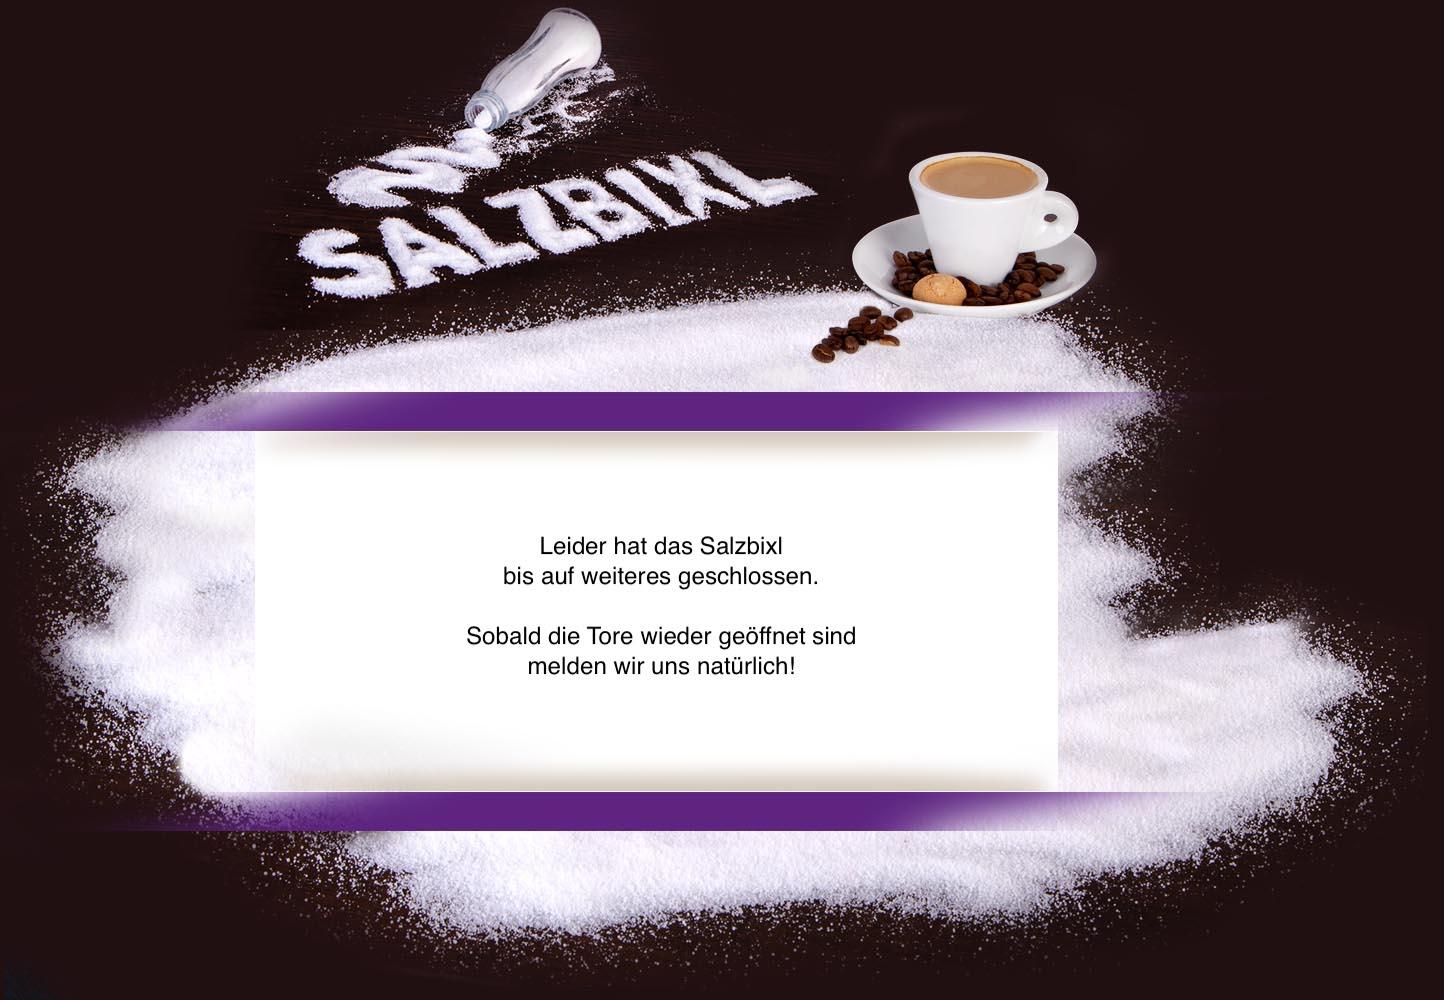 Salzbixl vorrübergehend geschlossen